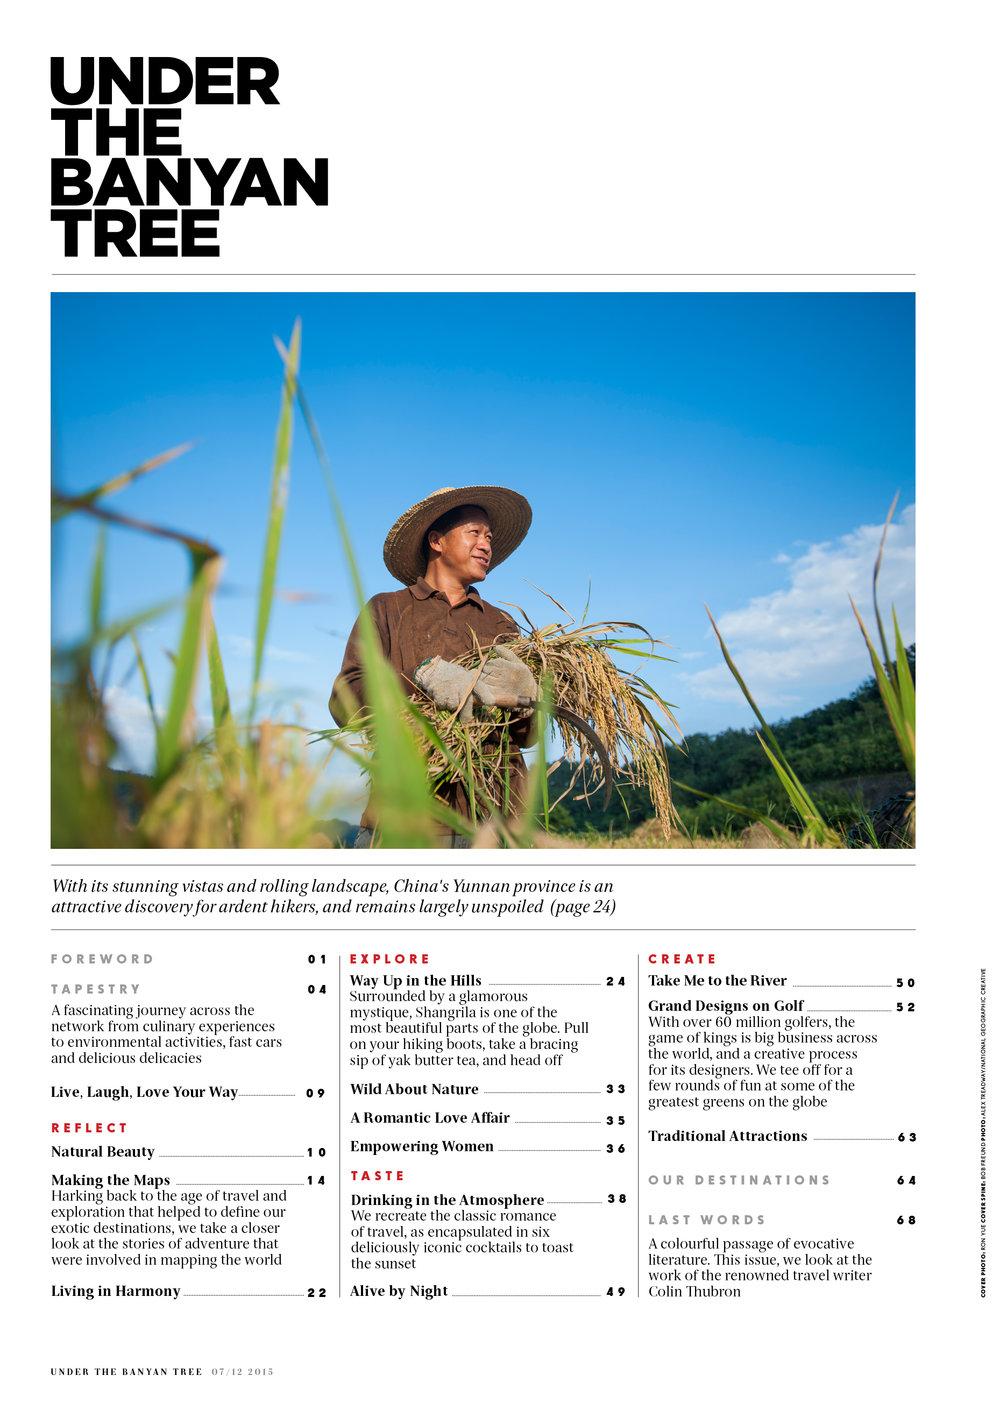 Under the Banyan Tree Magazine